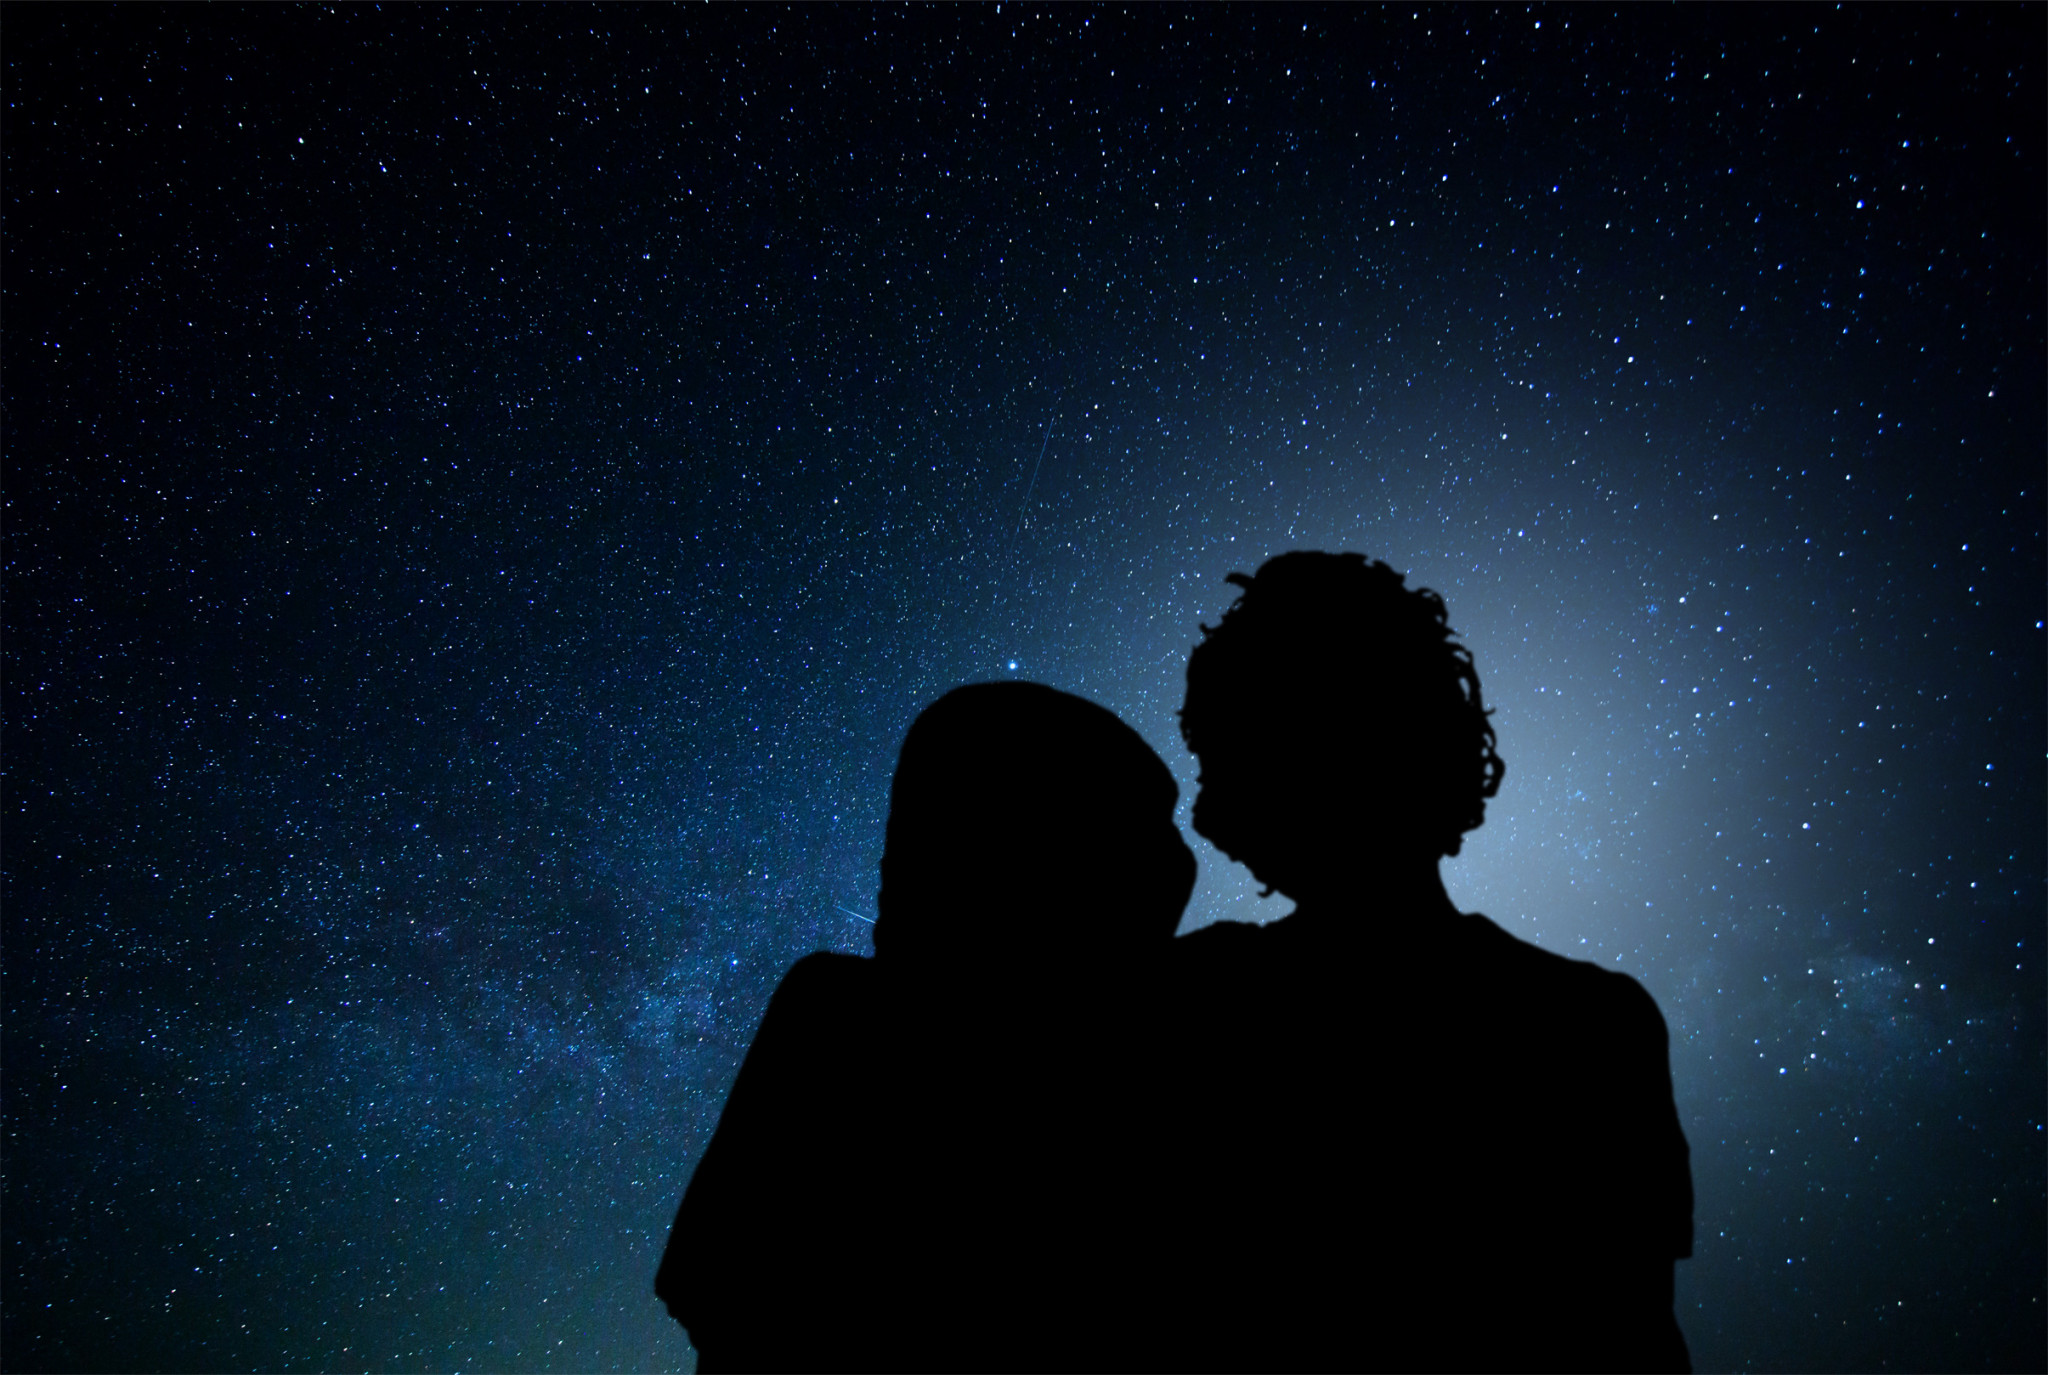 stockvault-romantic-couple-watching-the-stars176433